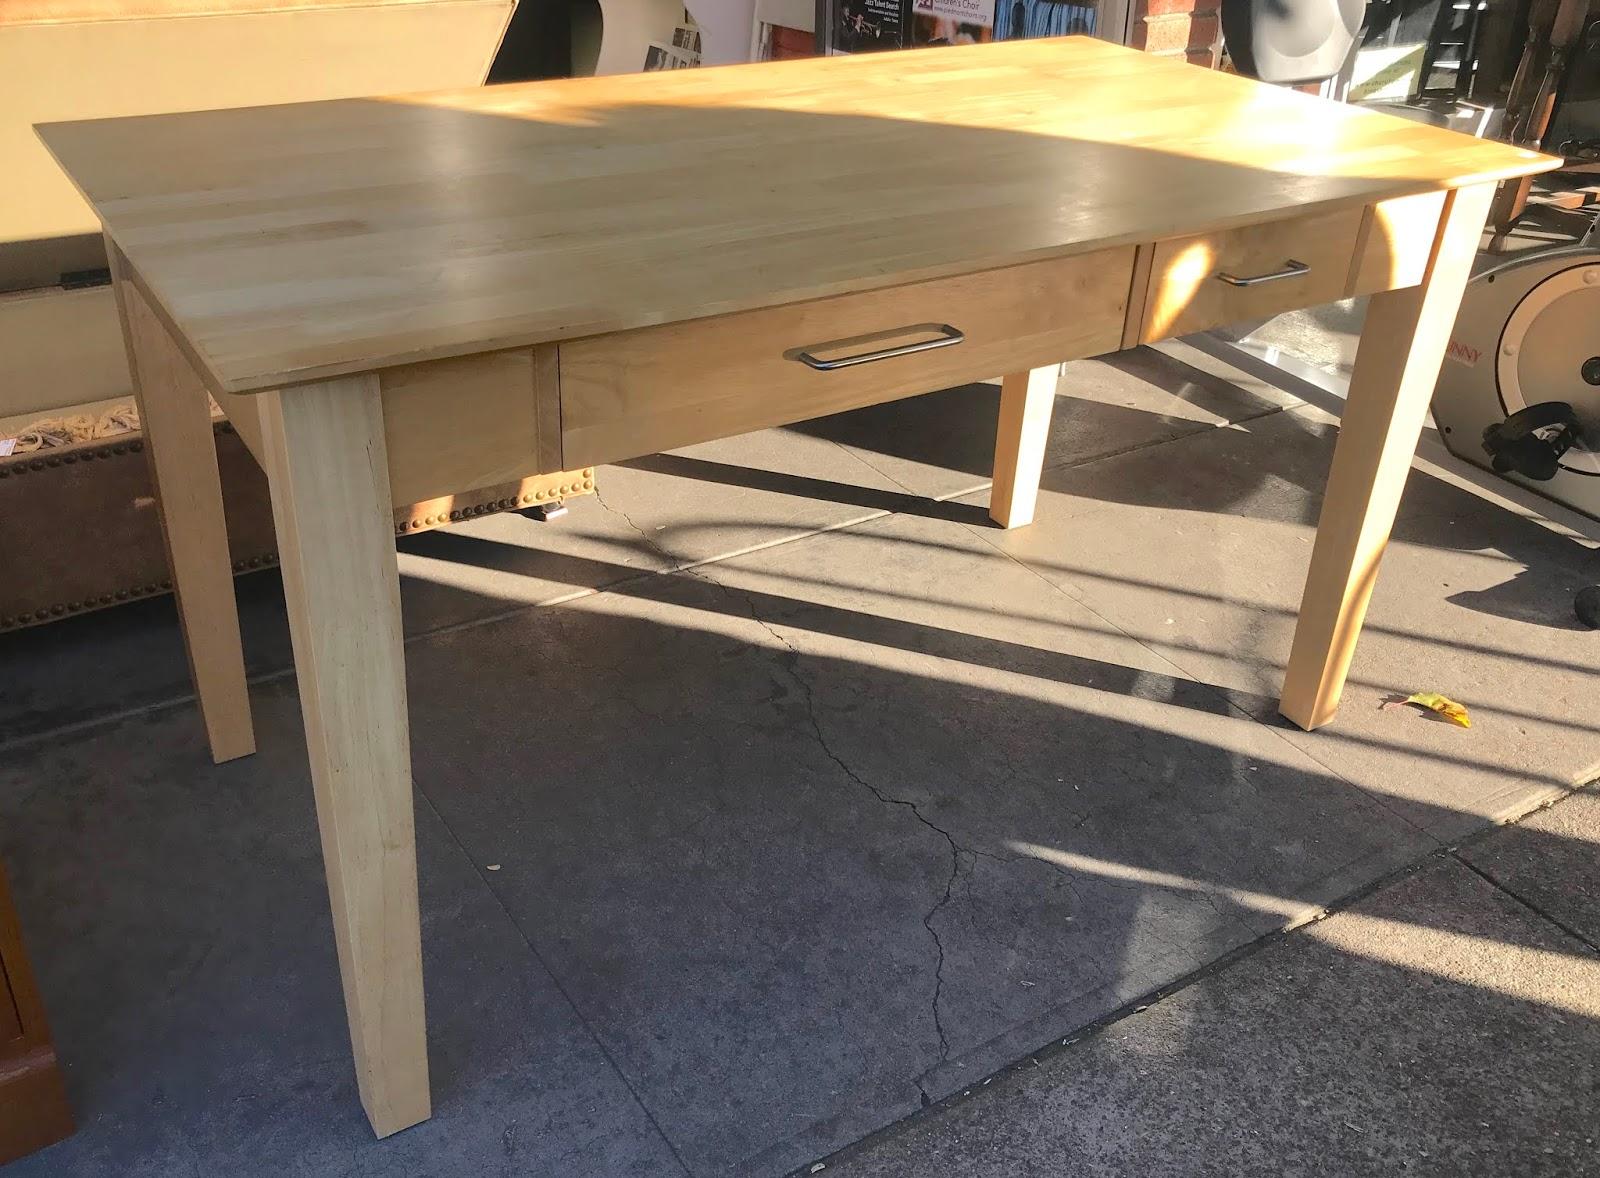 Wandplank 30 Diep.Uhuru Furniture Collectibles Sold 25022 Ashwood 56 X 30 Deep